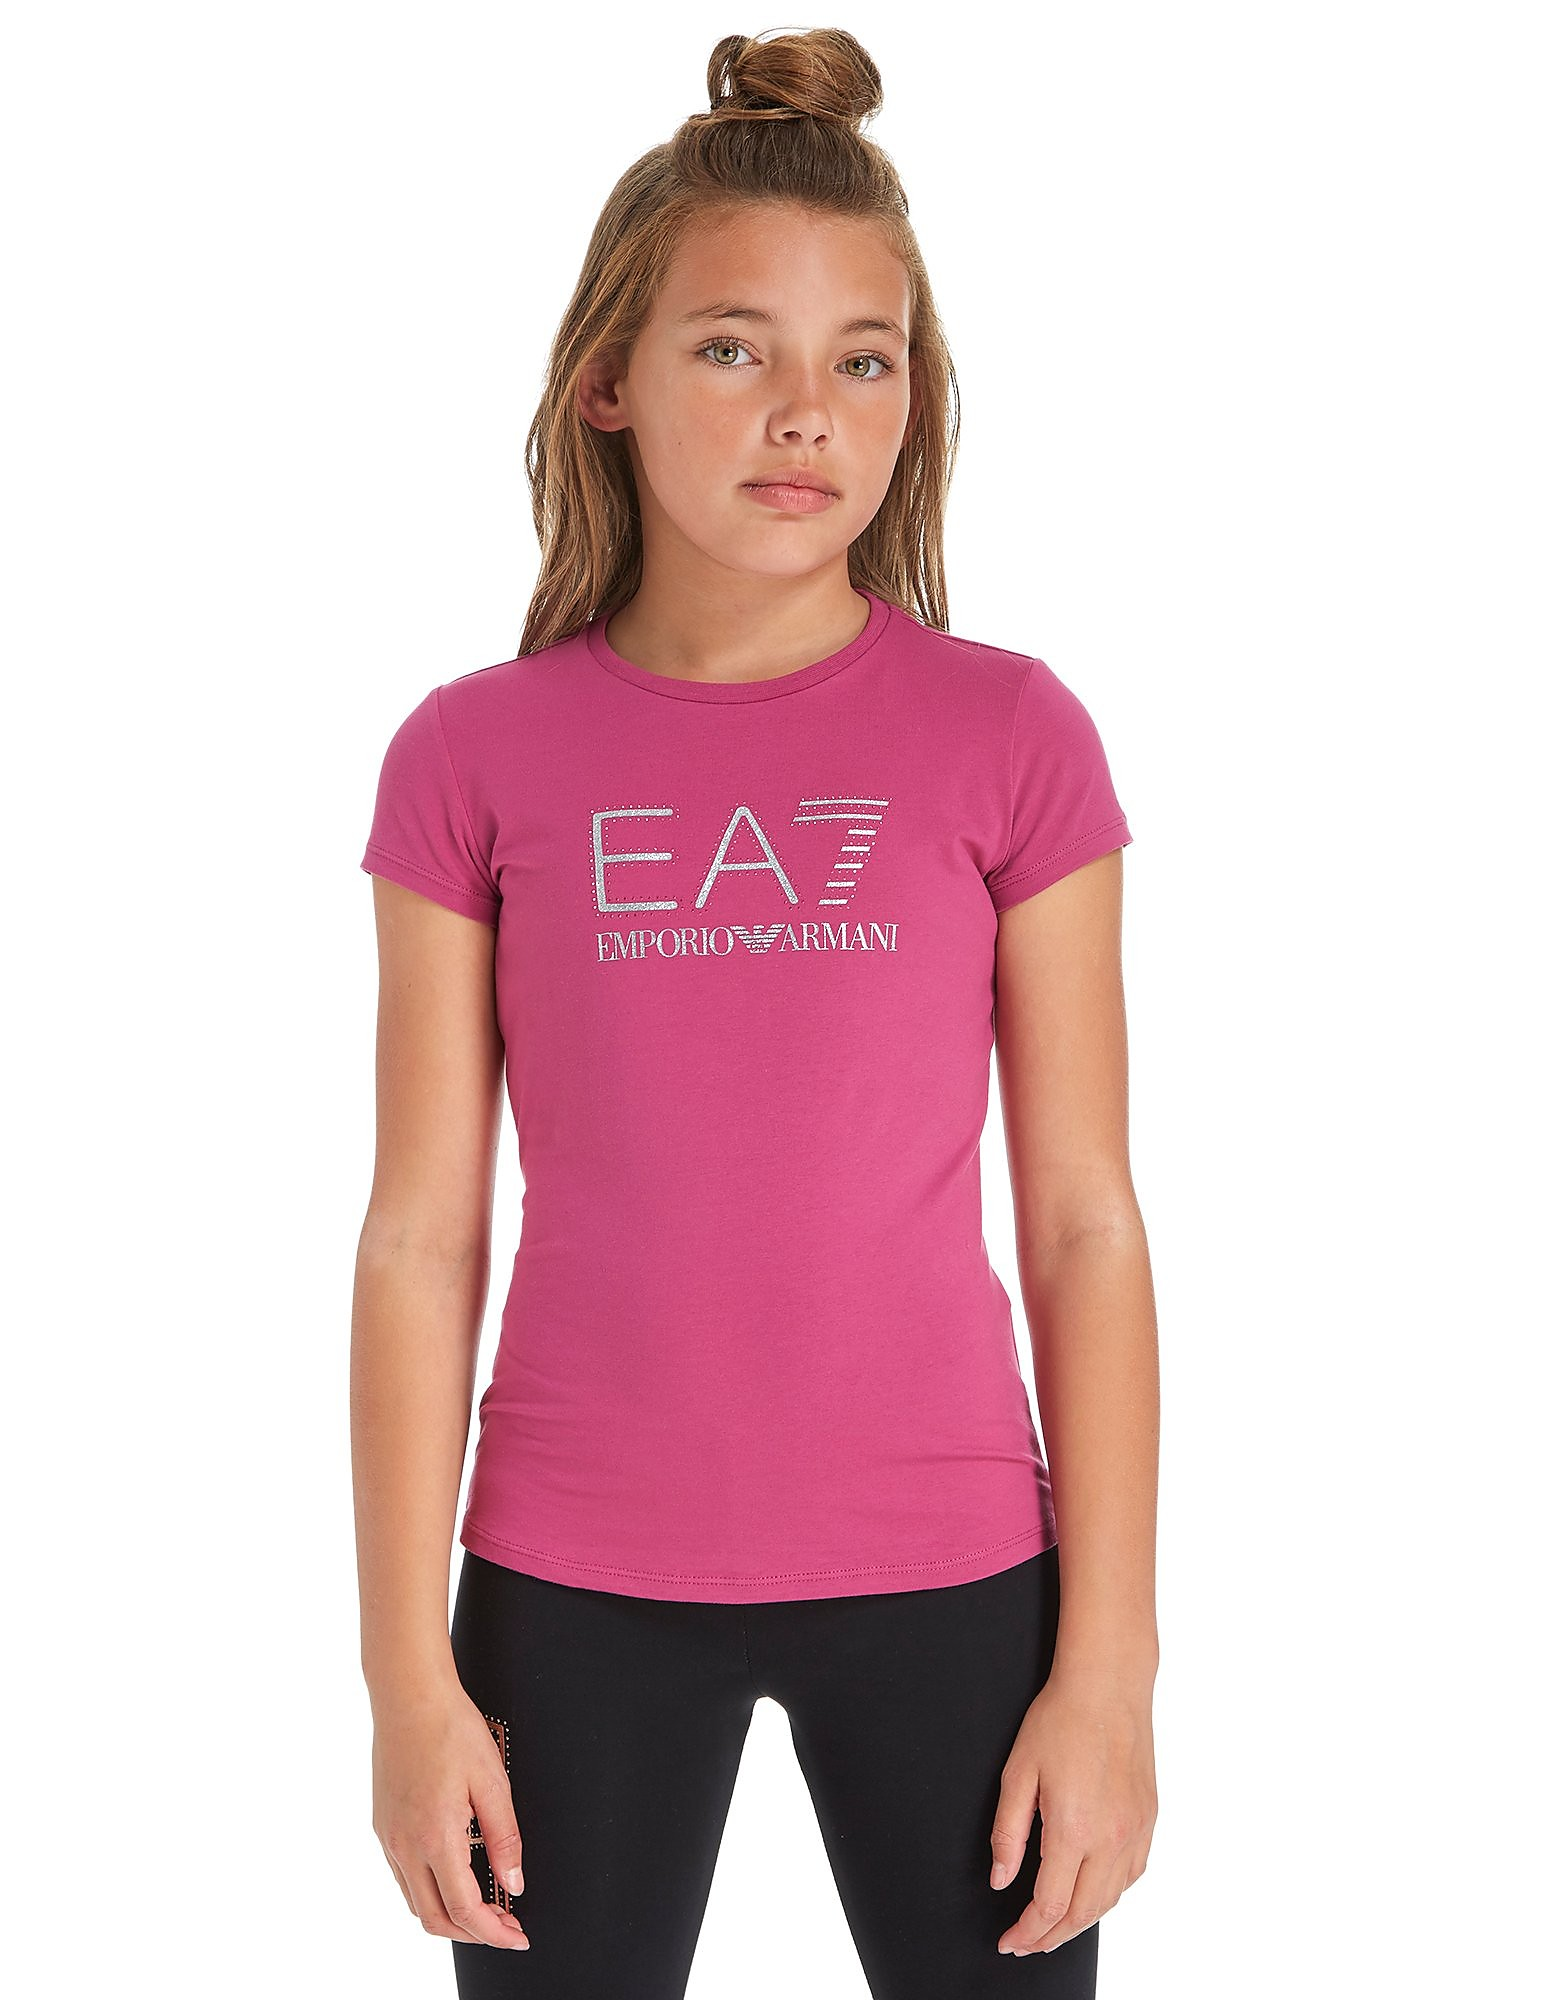 Emporio Armani EA7 Girls' Studded Glitter T-Shirt Junior